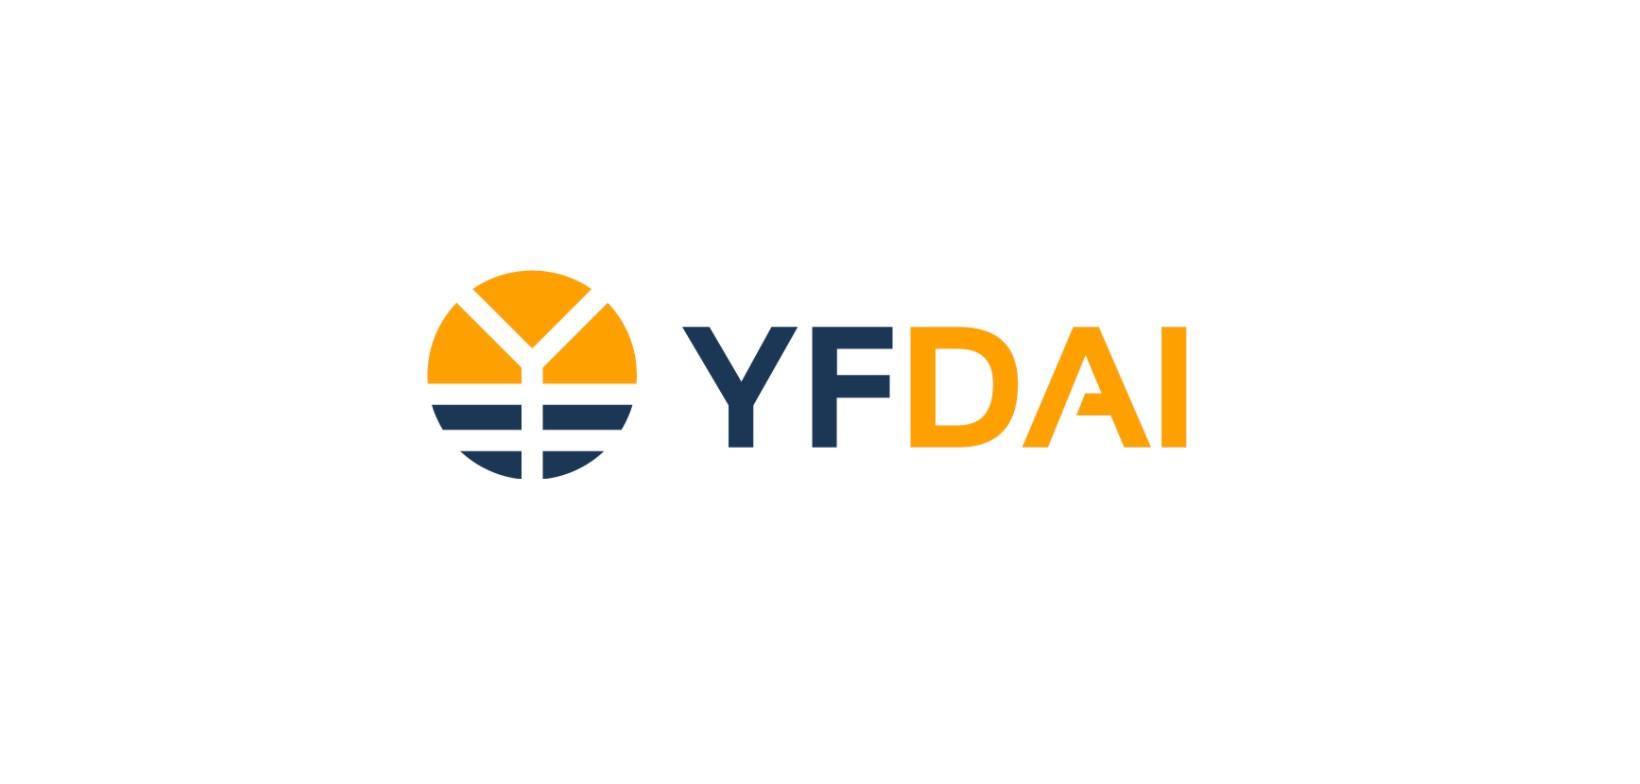 Here's How YFDAI Finance is Boosting Defi Adoption